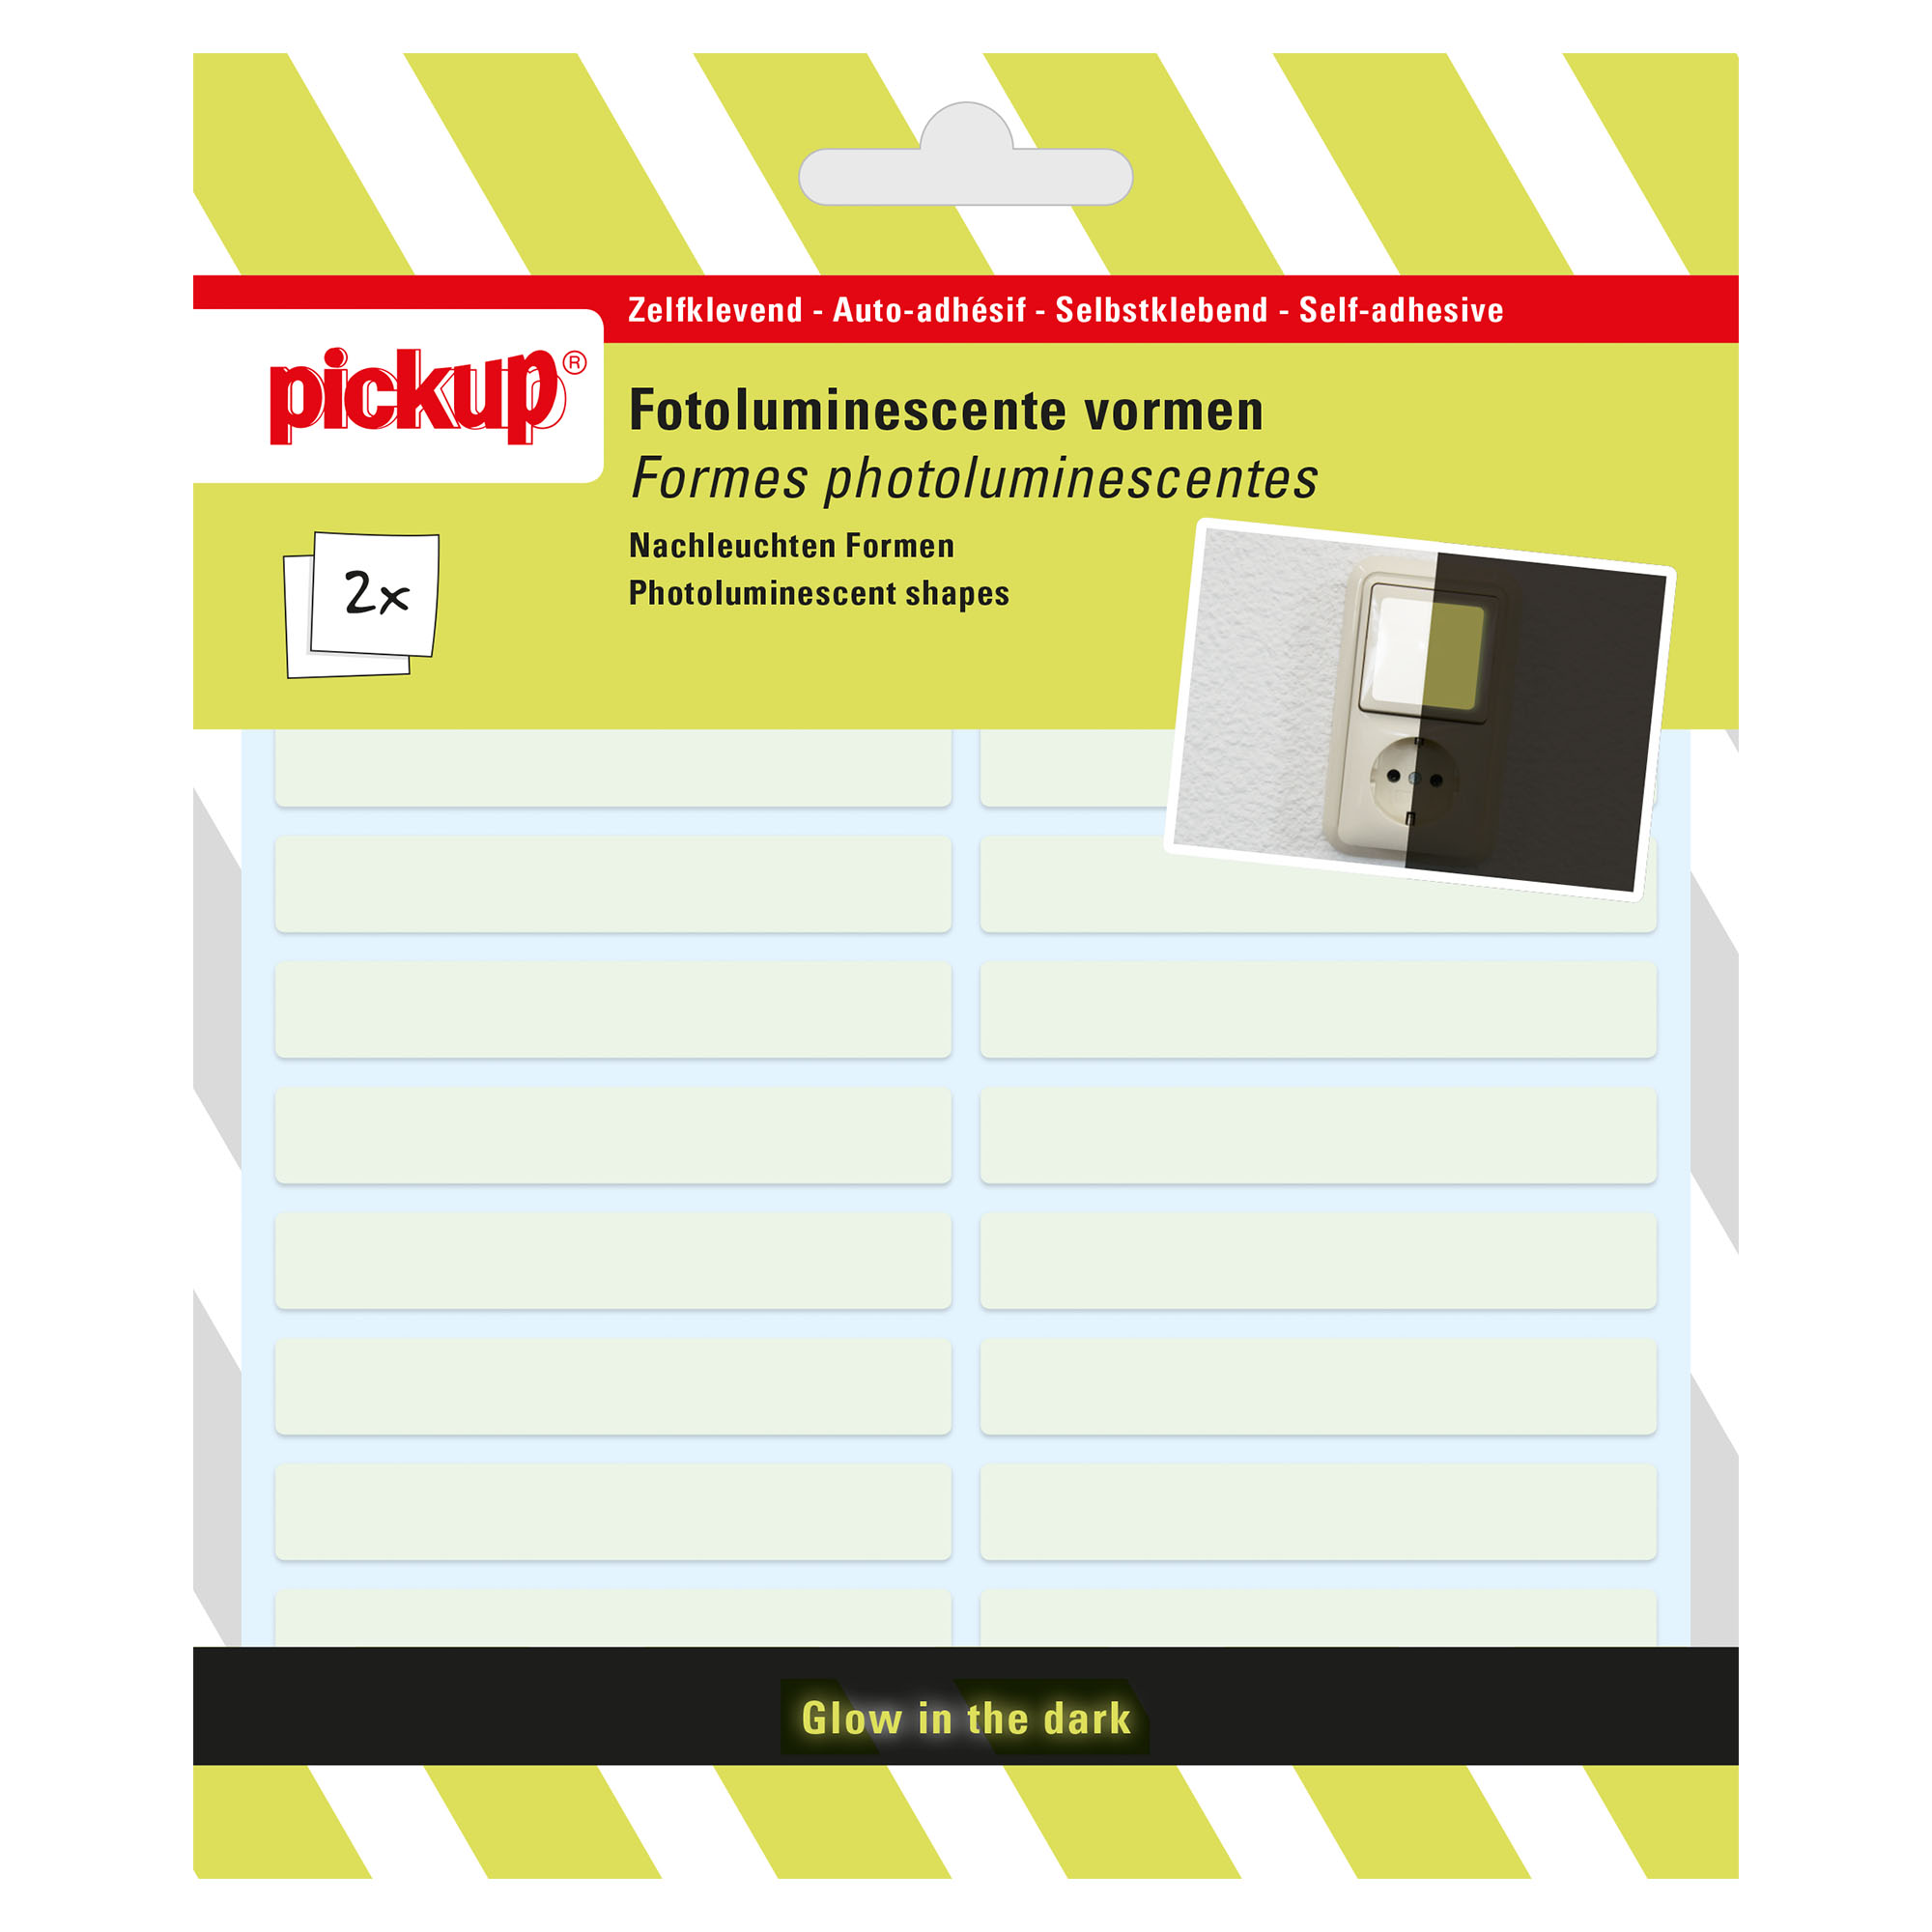 Pickup Fotoluminiscerende vorm transparant - 7x1 cm fotoluminiscent